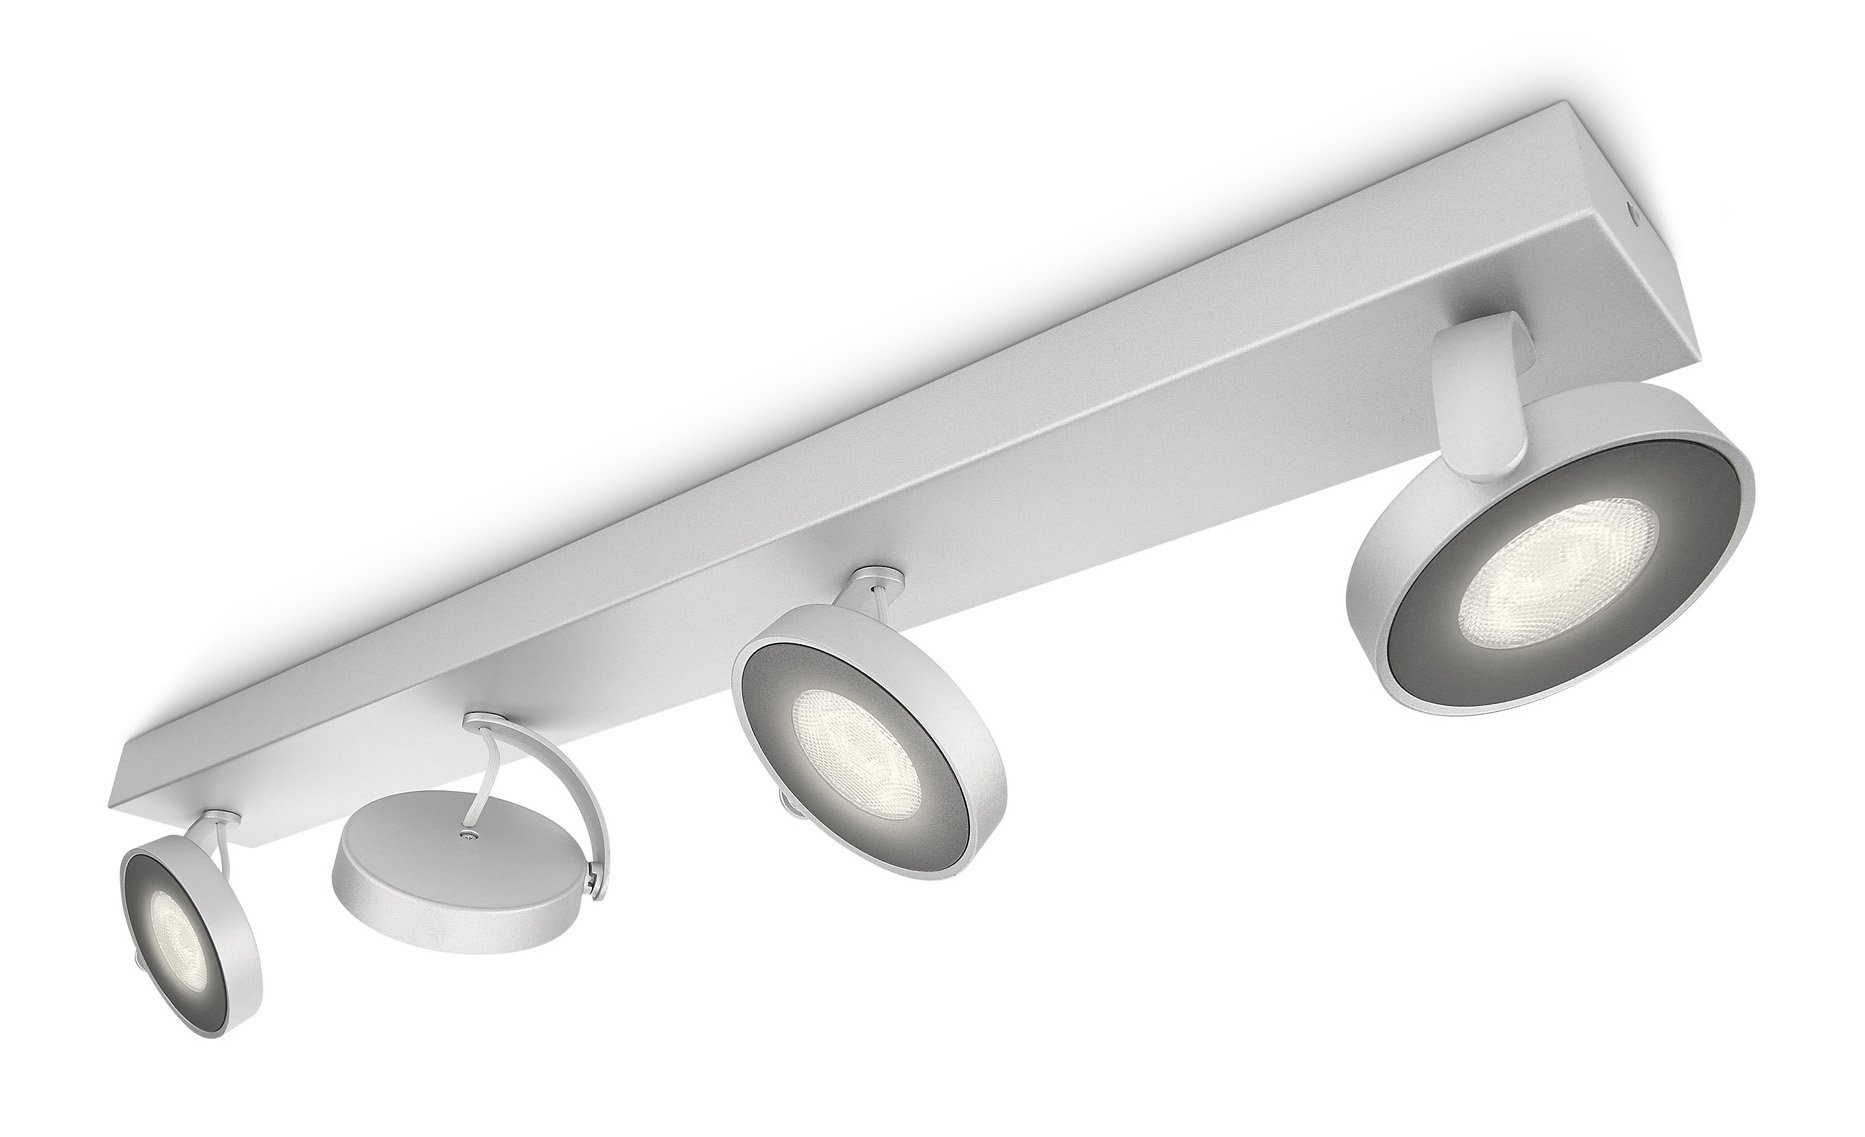 CLOCKWORK LED spotlamp MyLiving by Philips 53174-48-16